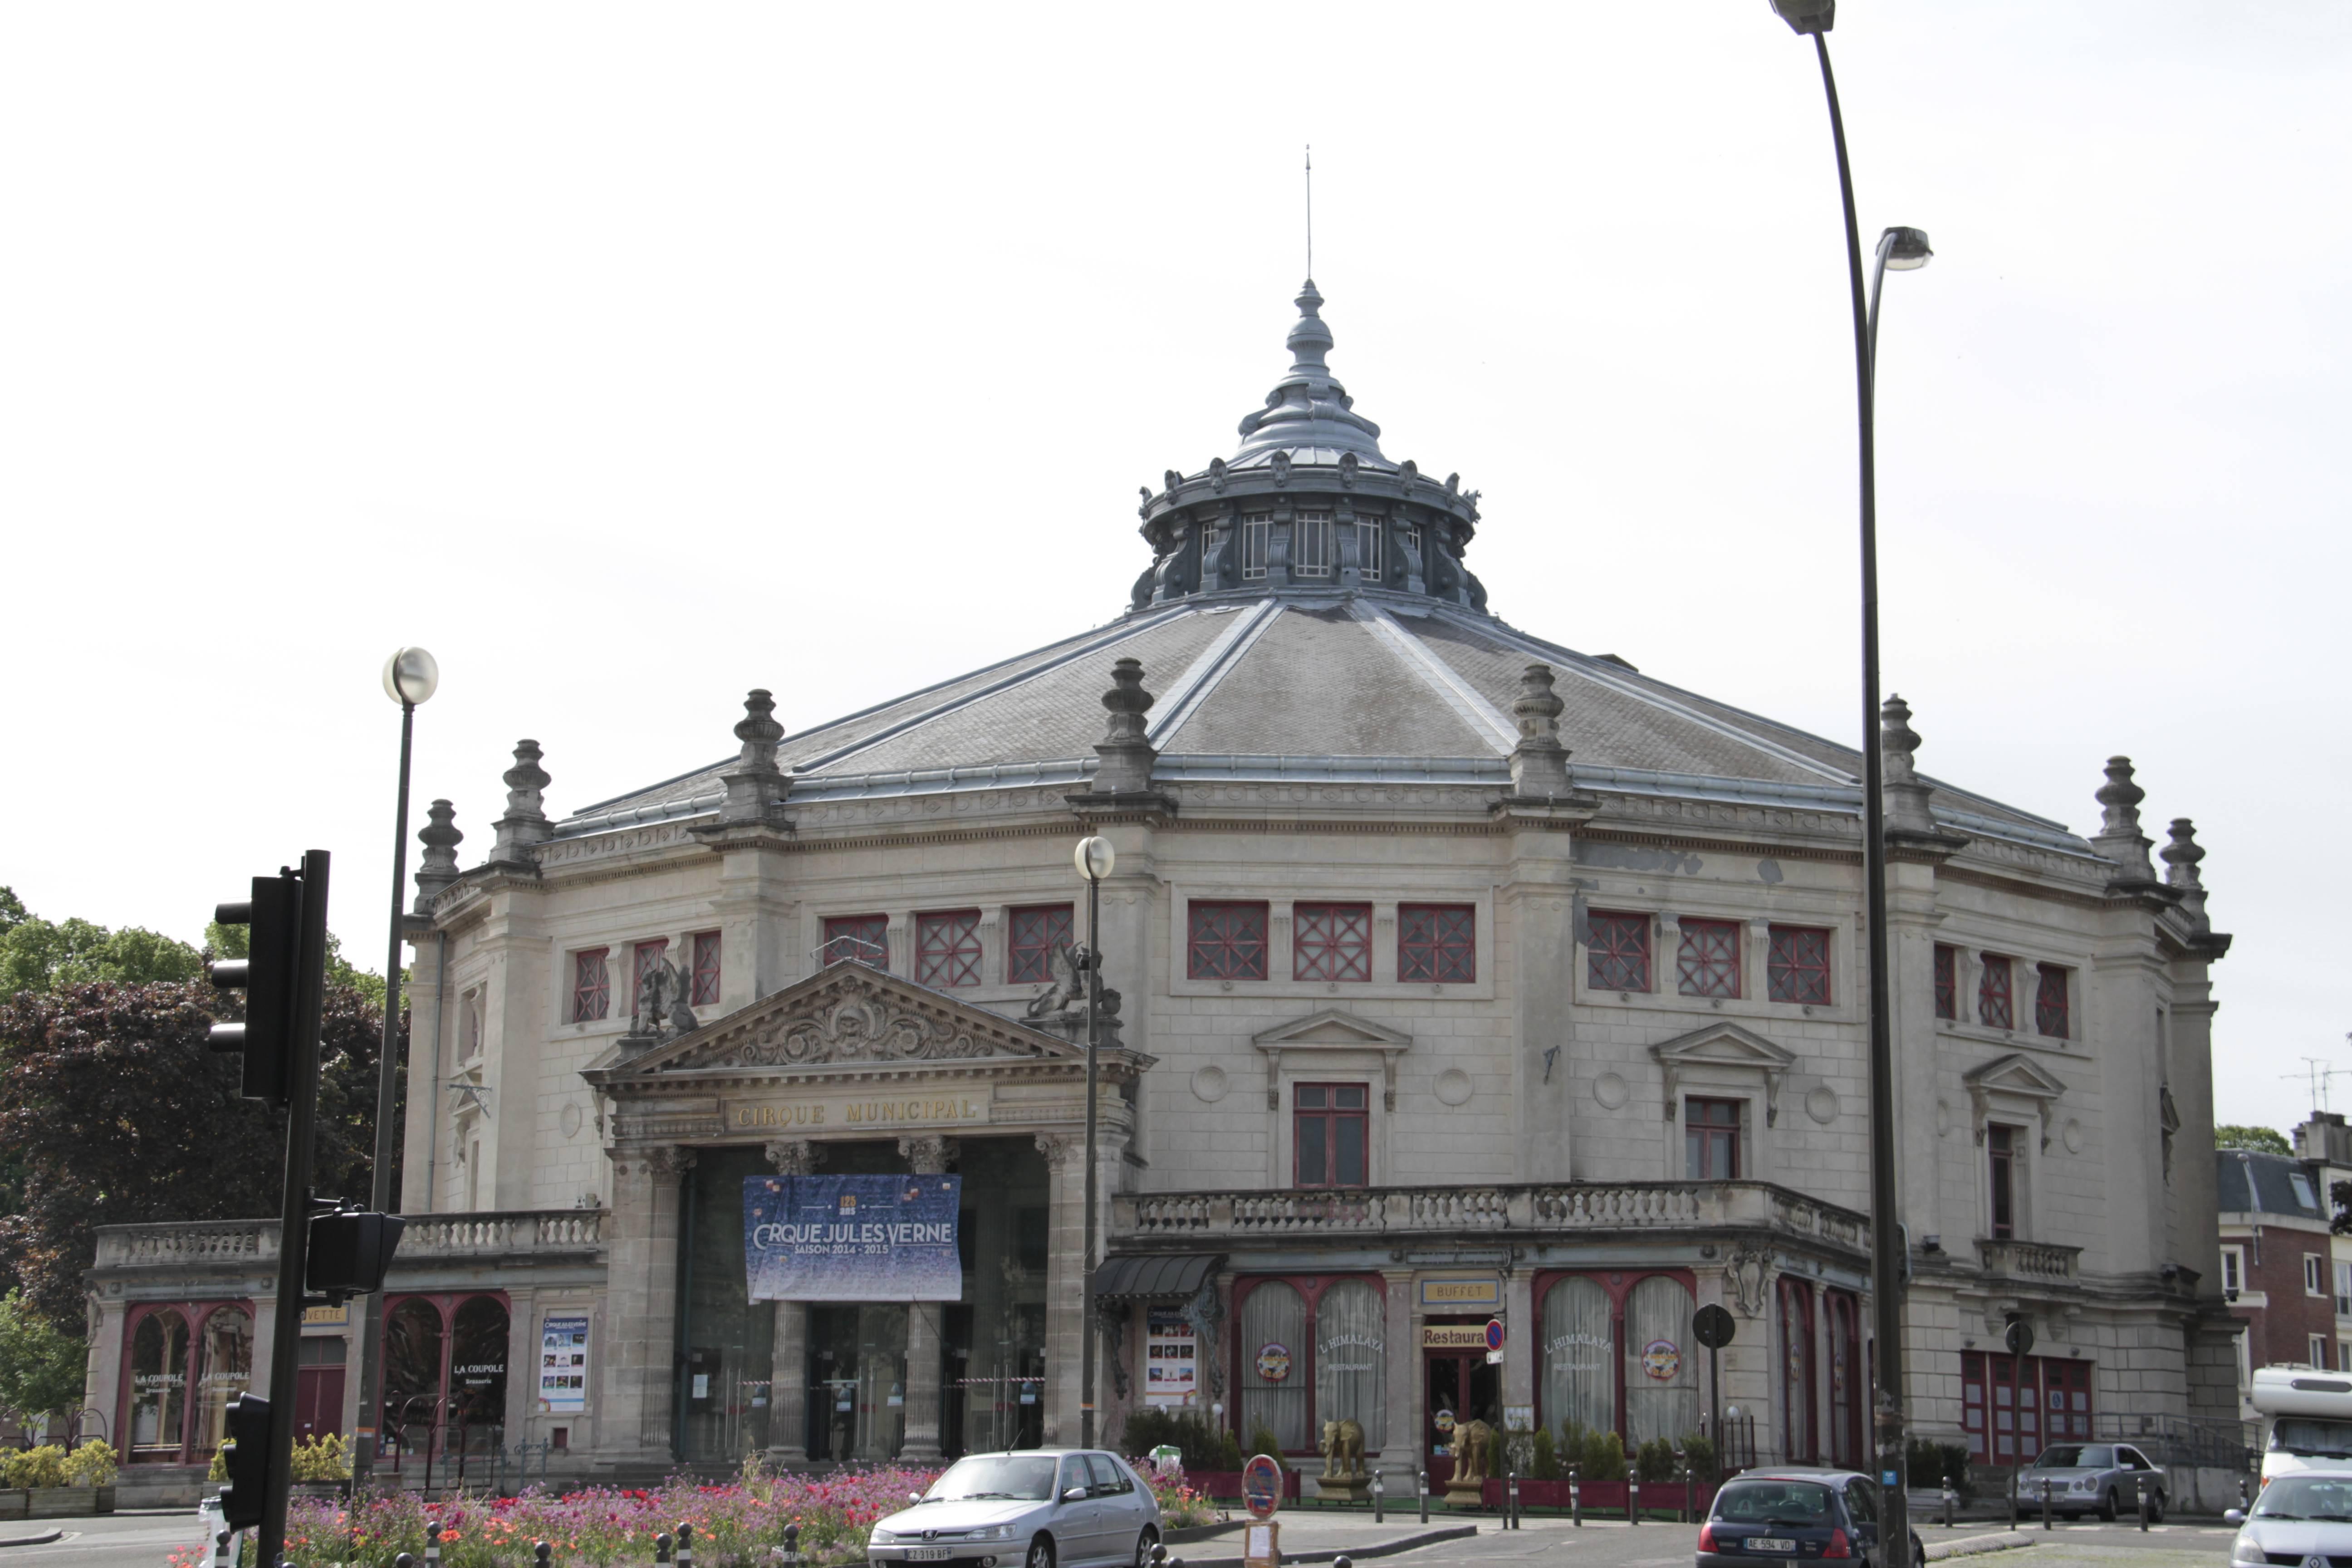 Baie de Somme mai 2015_0002 Amiens Cirque Jules Verne